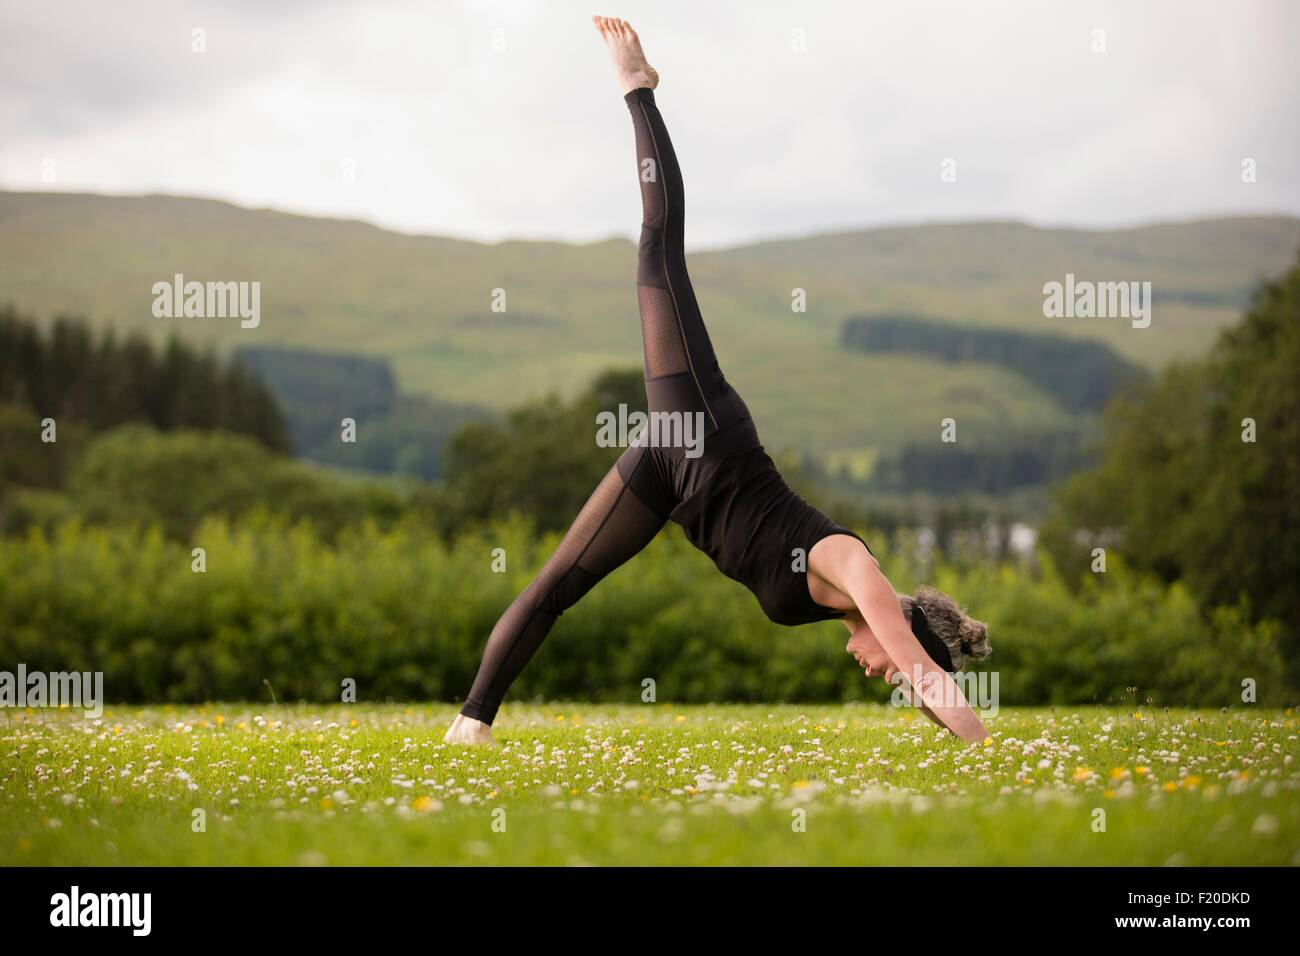 Mature woman practicing yoga leg lift in field - Stock Image